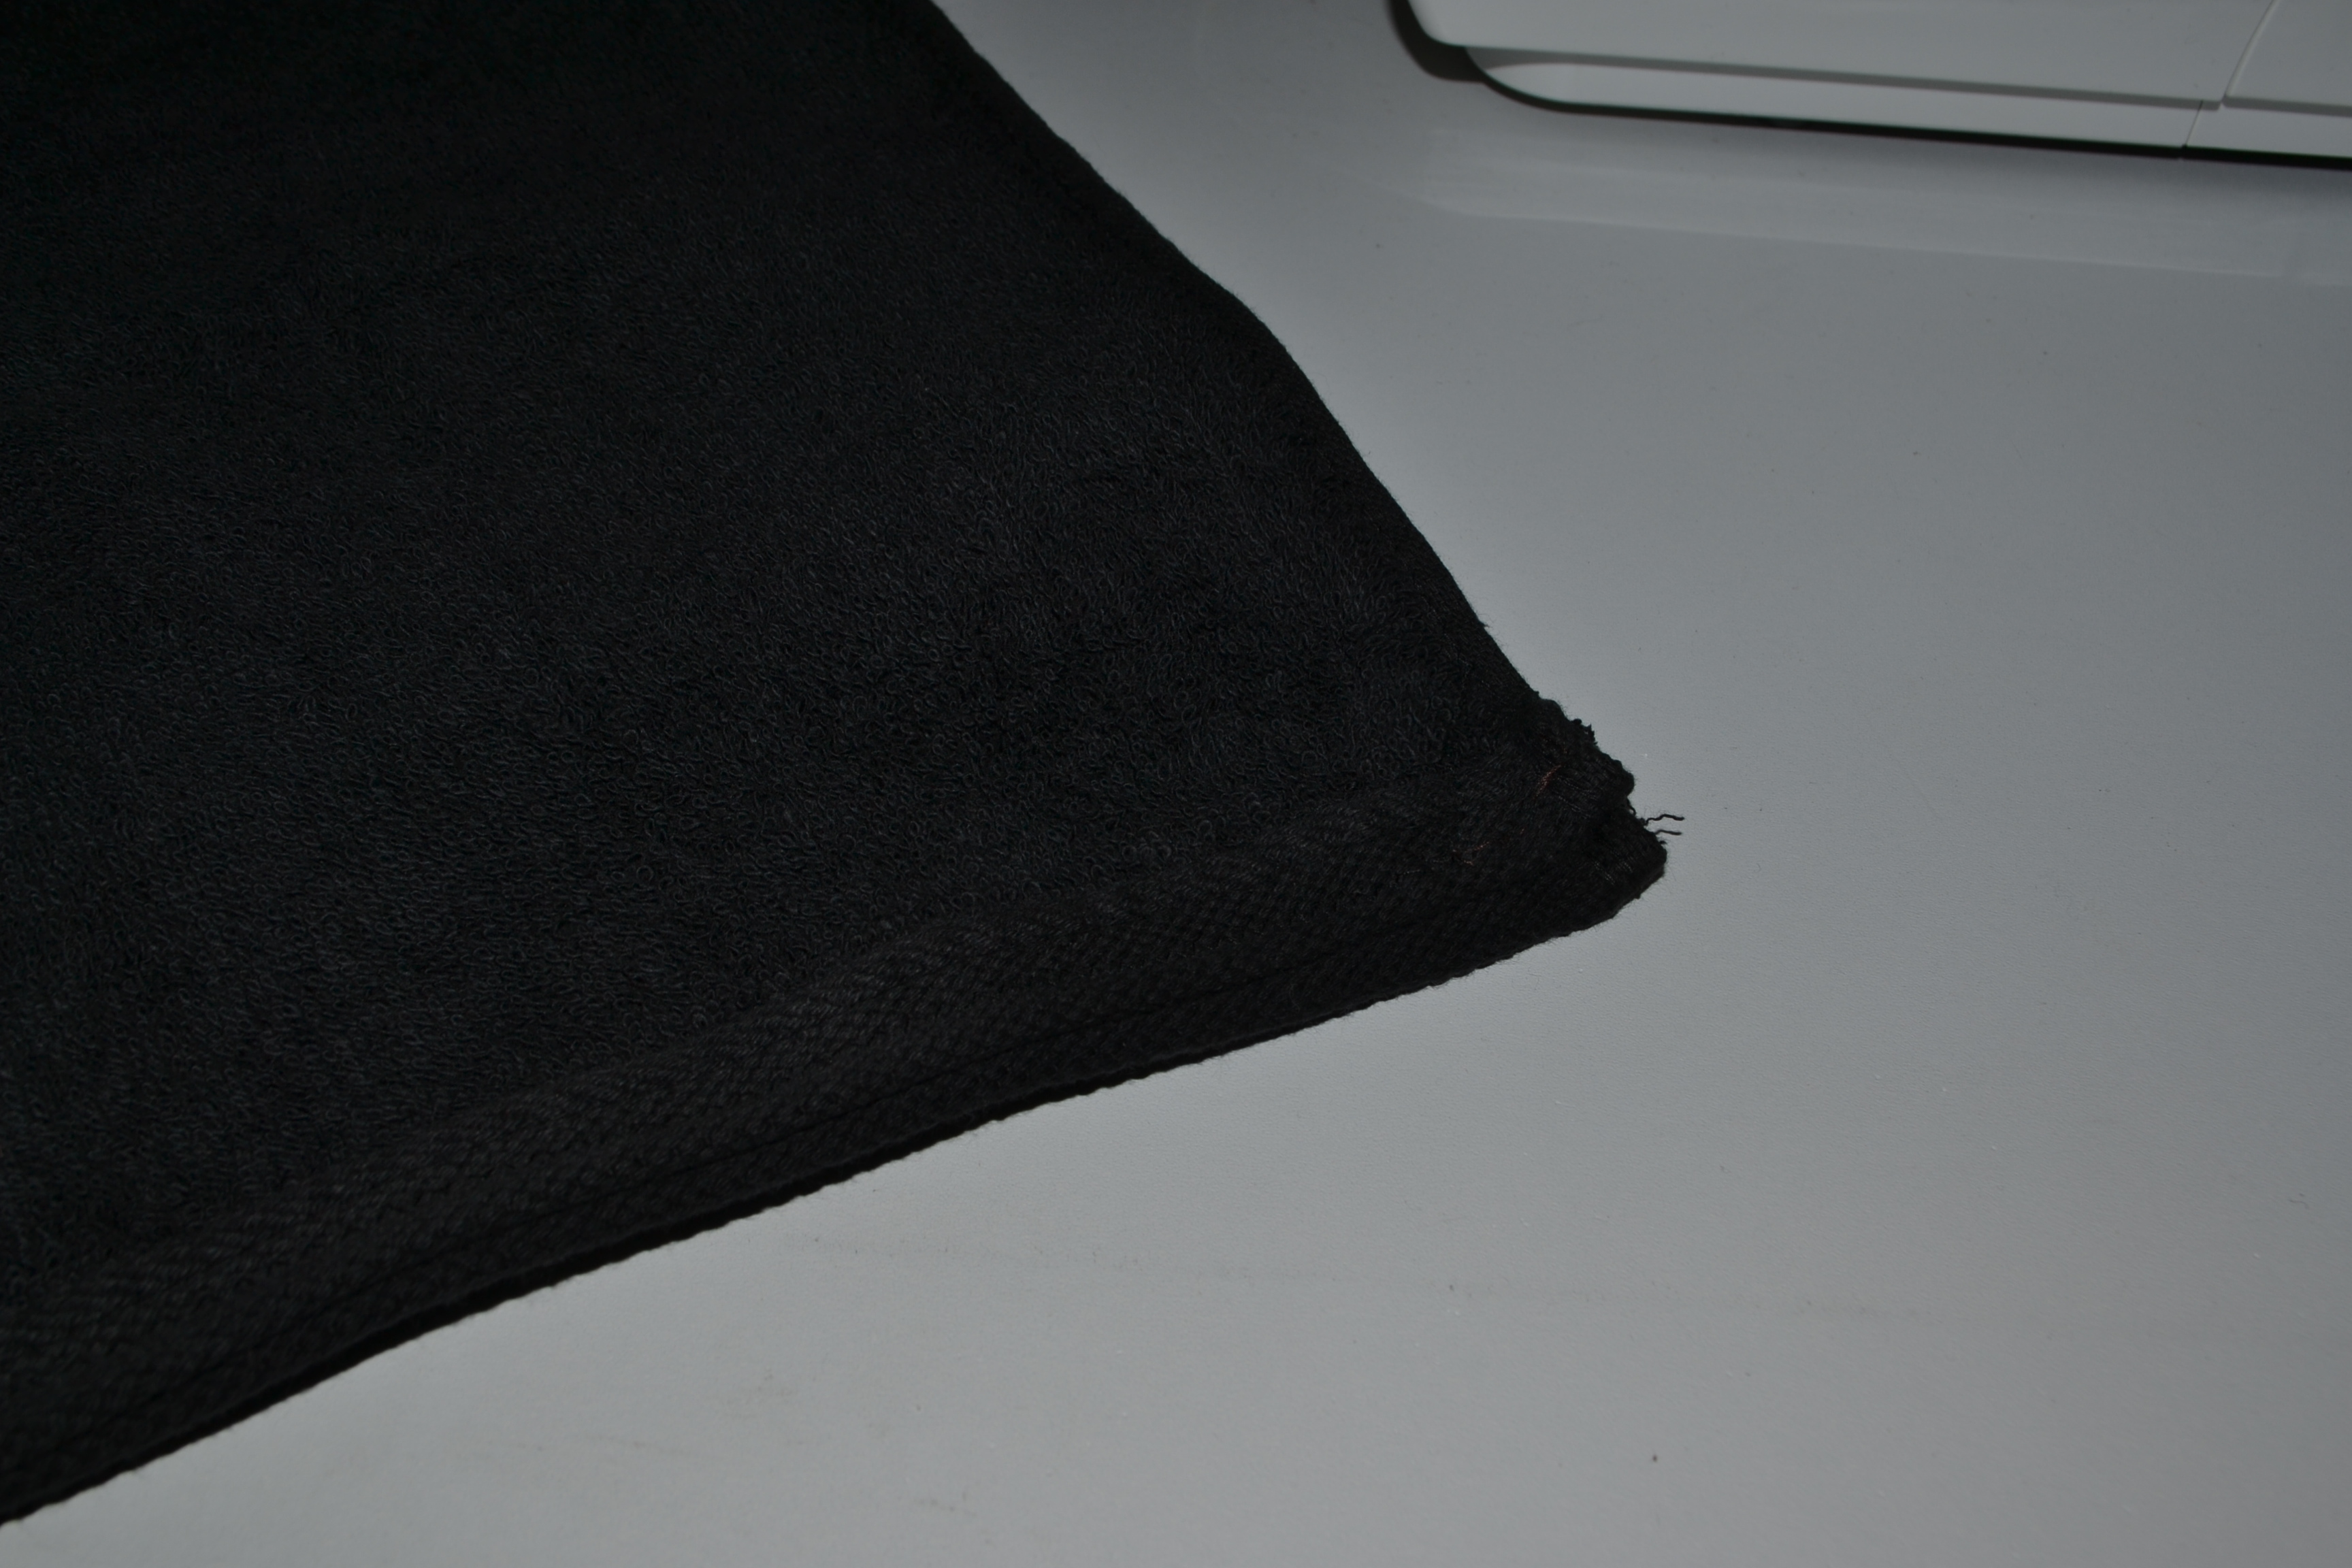 Car Floor Mat Towel Sleeves | Design Life Hacks